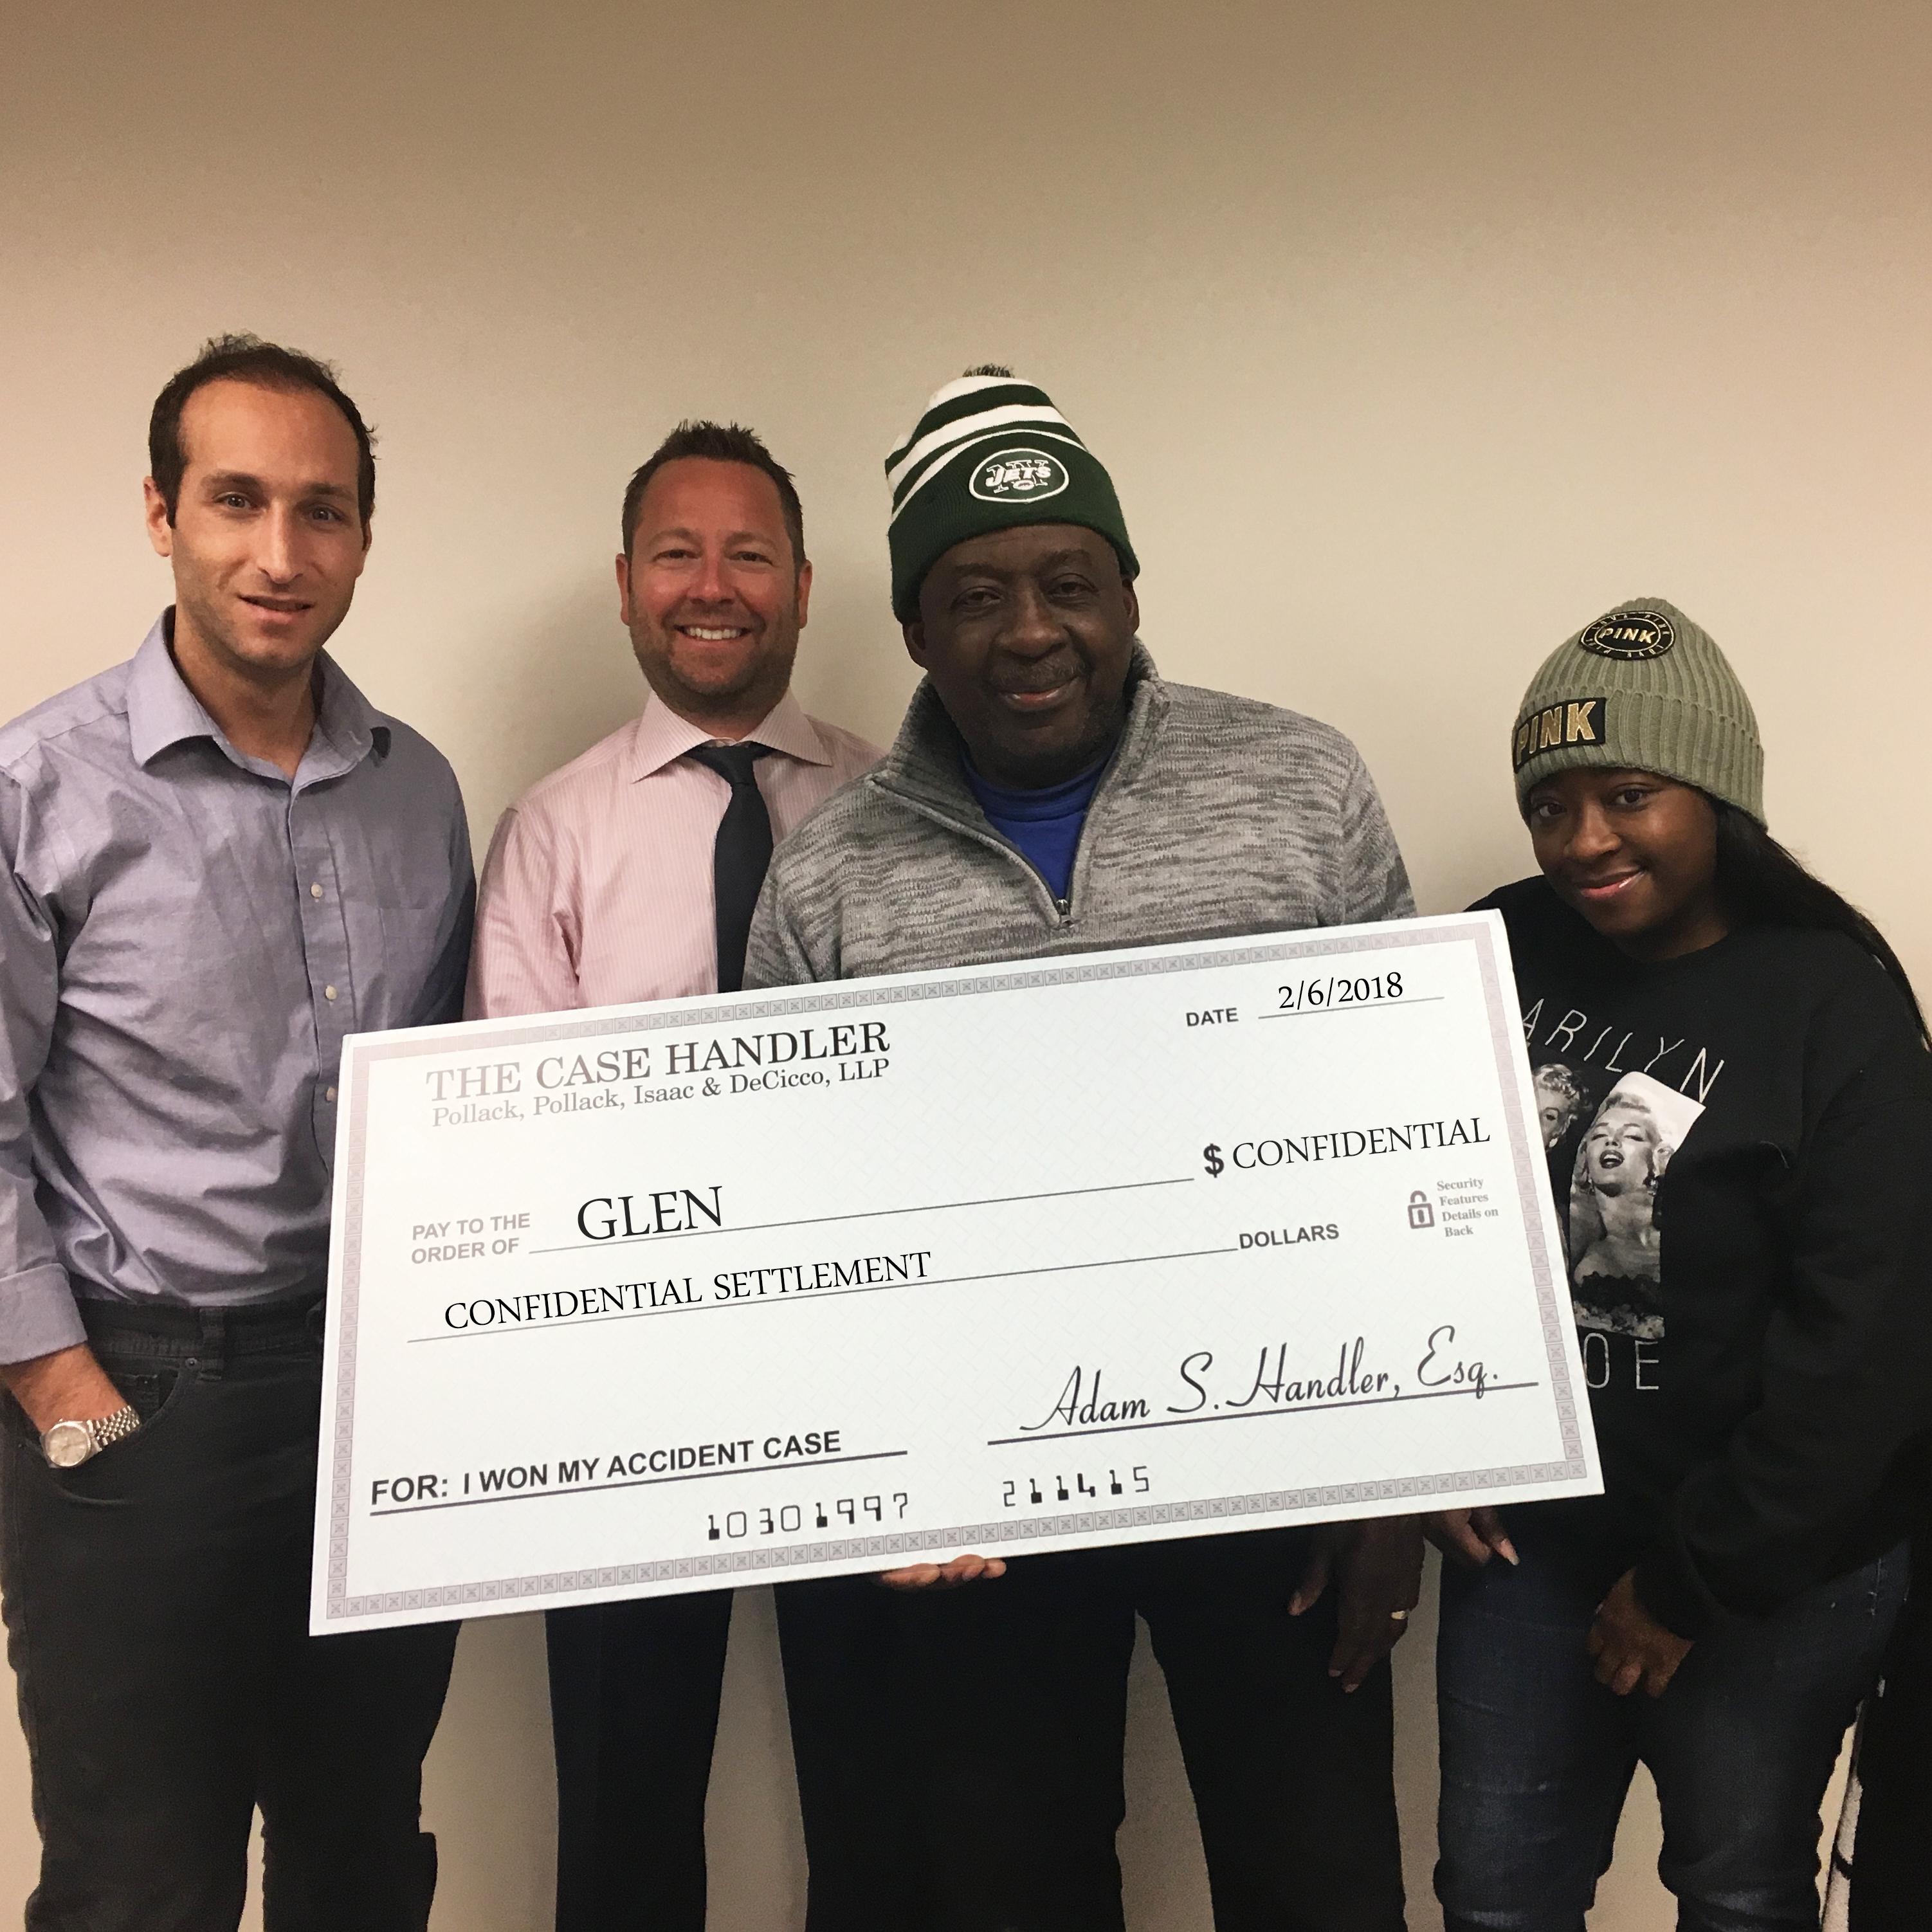 bronx accident lawyer Glen settlement day